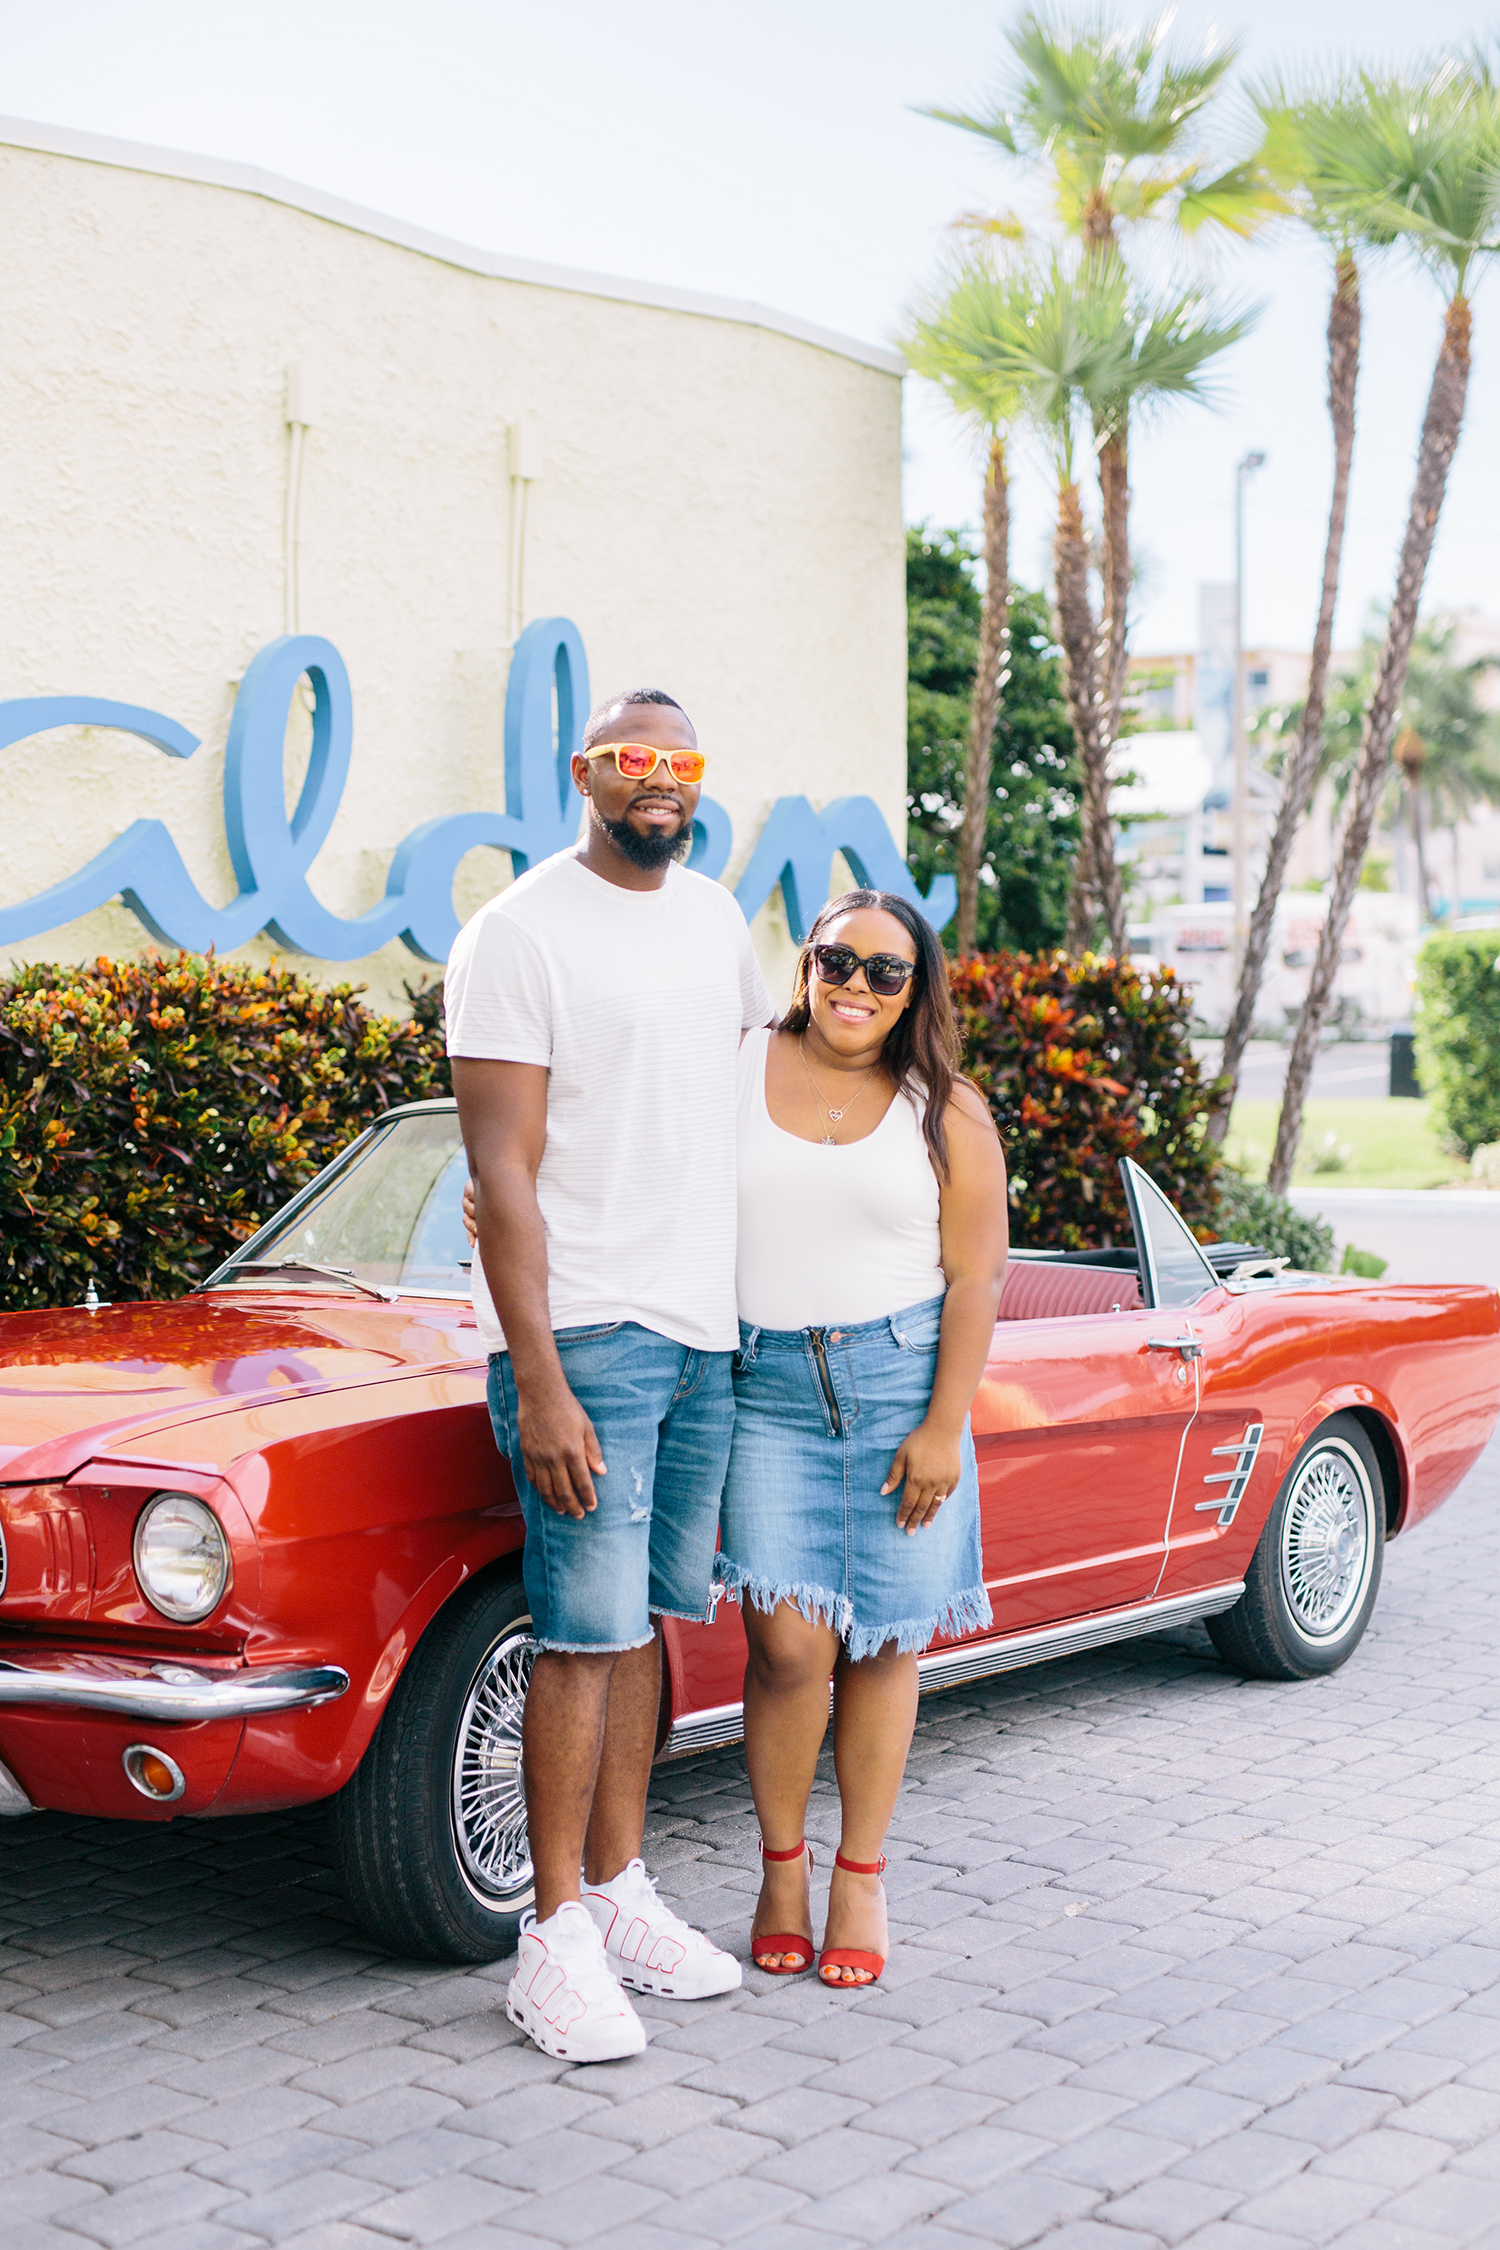 Florida Blogger Bianca Dottin takes a couples staycation